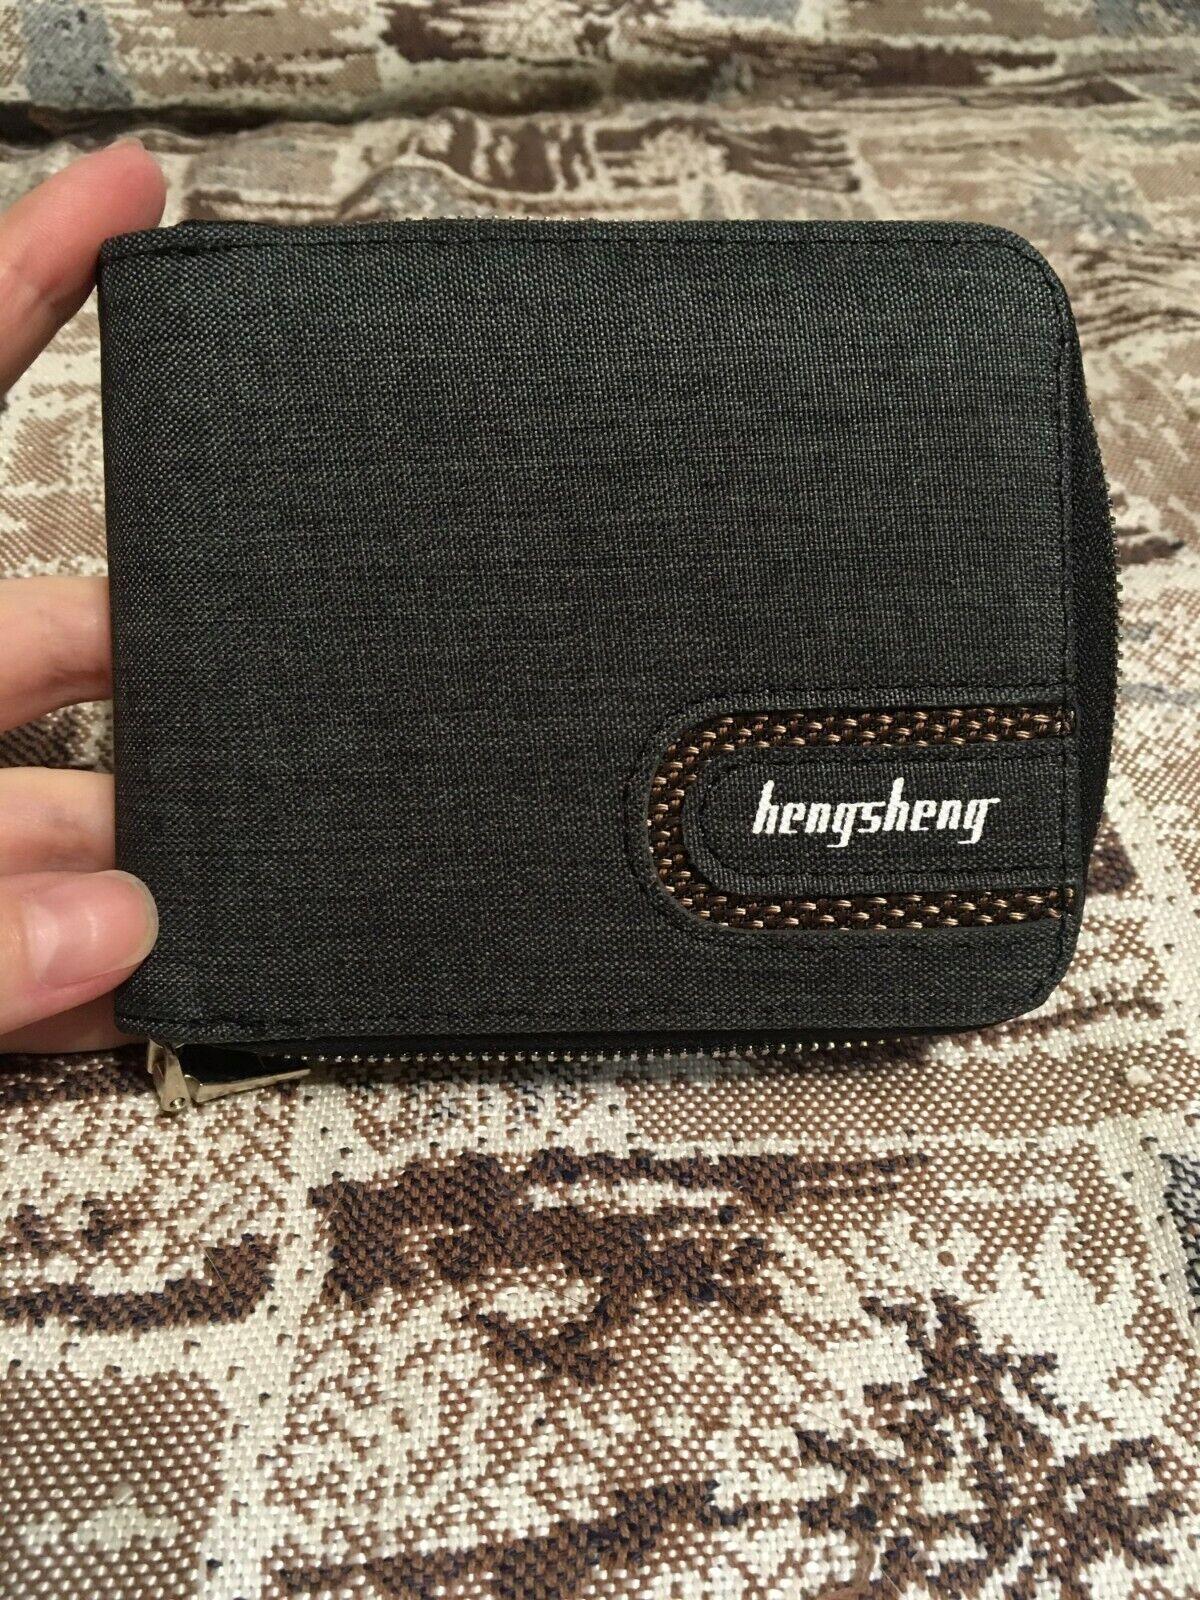 Canvas Men Wallet With Zipper For Money Coins Cards Clutch Purse Bag Black Grey